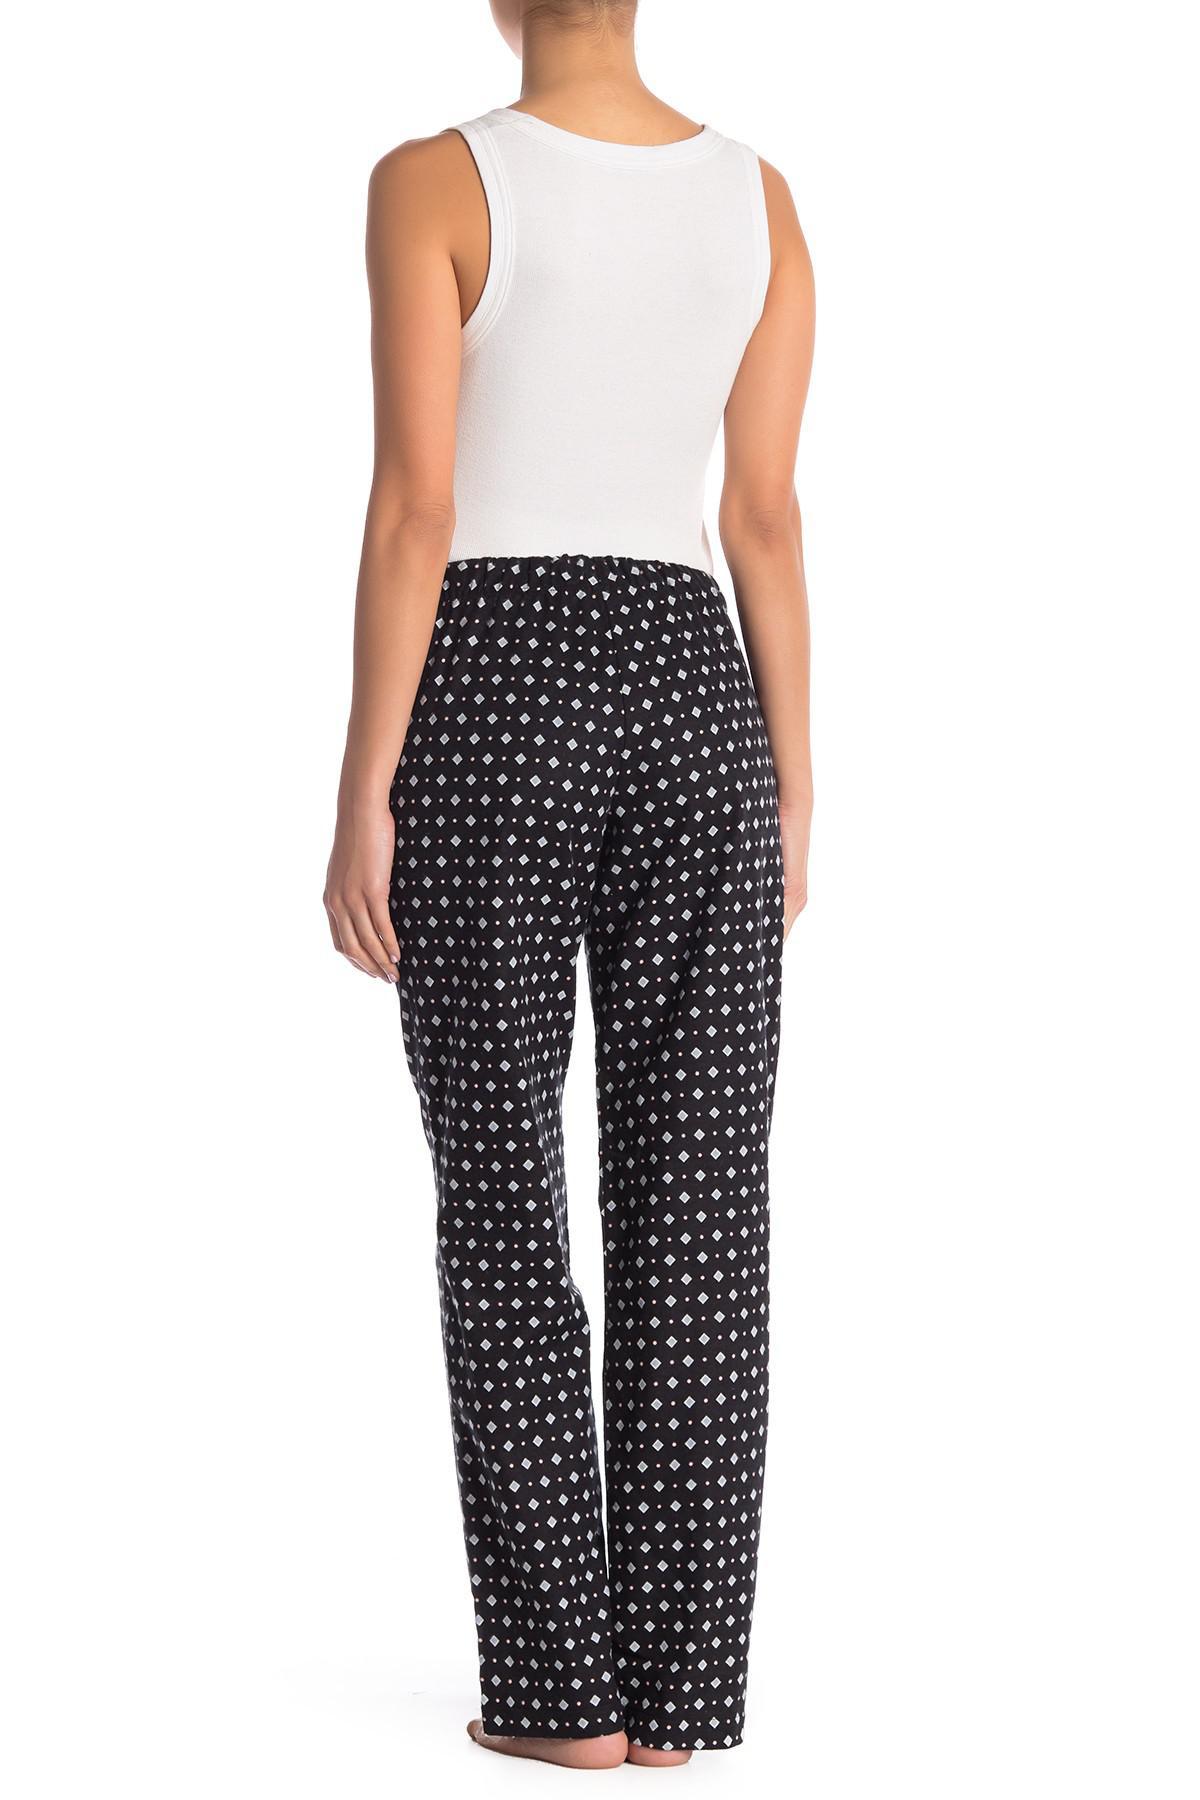 49e75f9c4d5f Maidenform - Black Flannel Pajama Pants - Lyst. View fullscreen